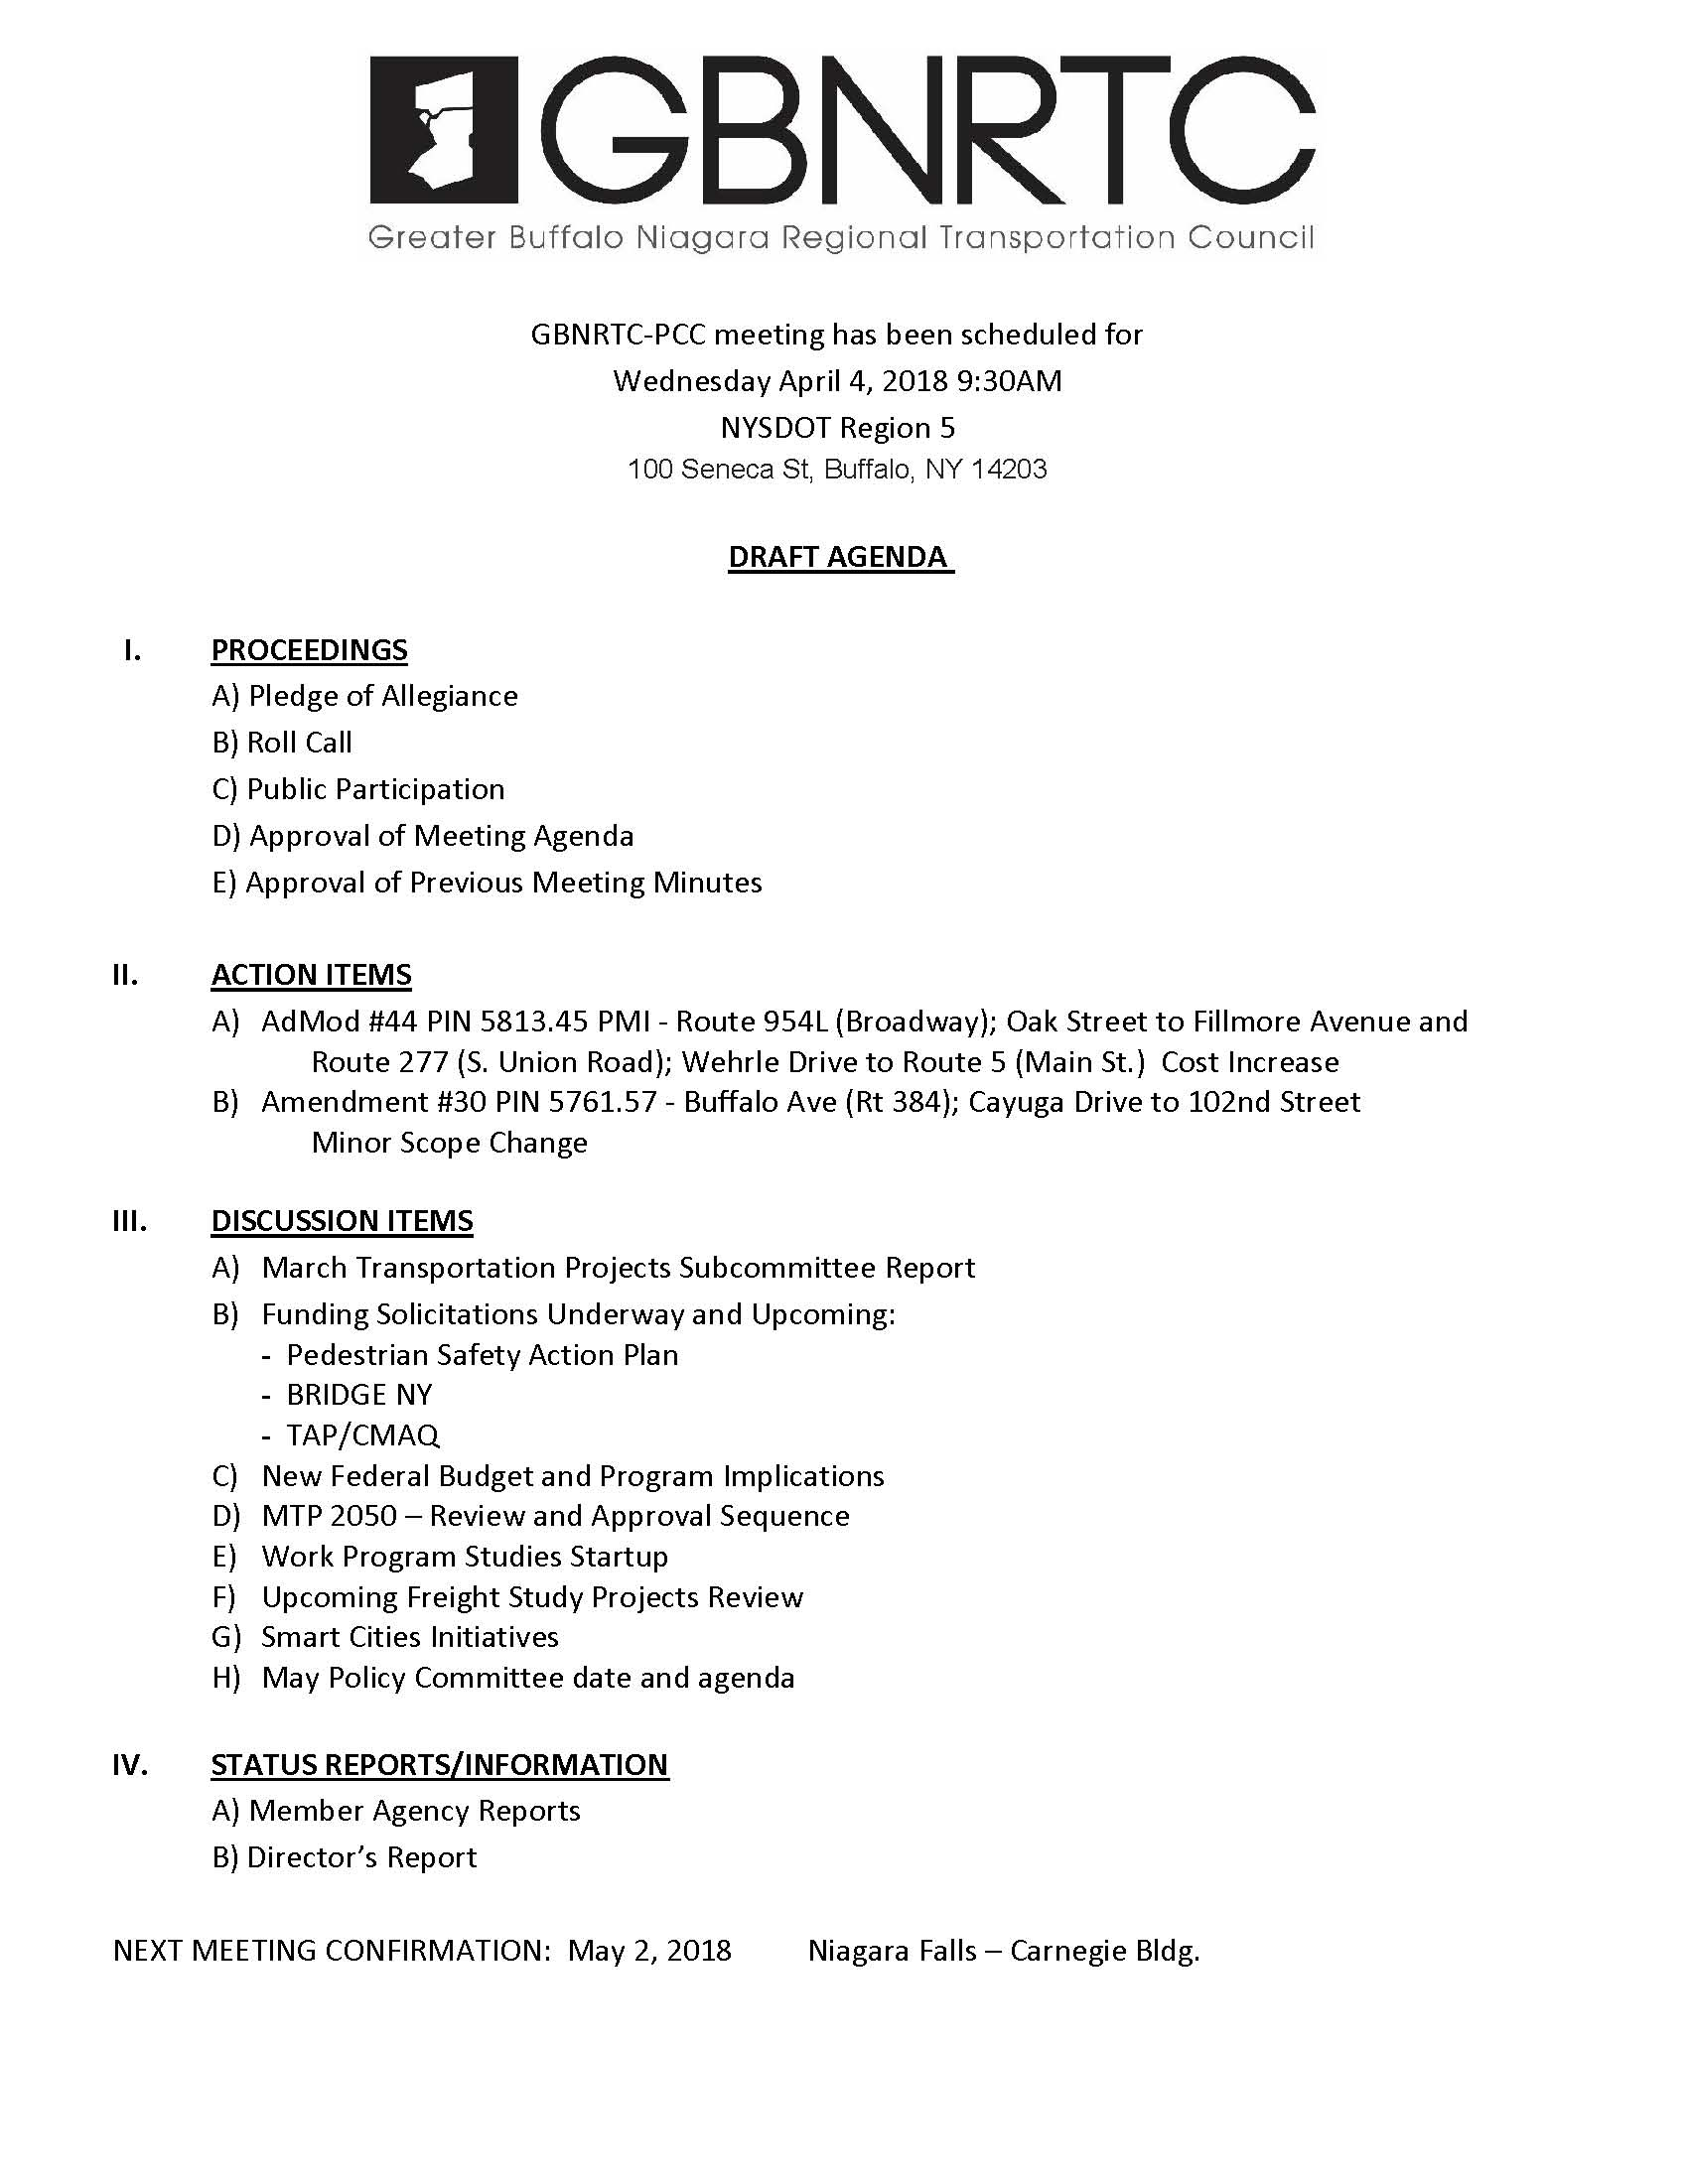 PCC Draft Agenda April 4, 2018